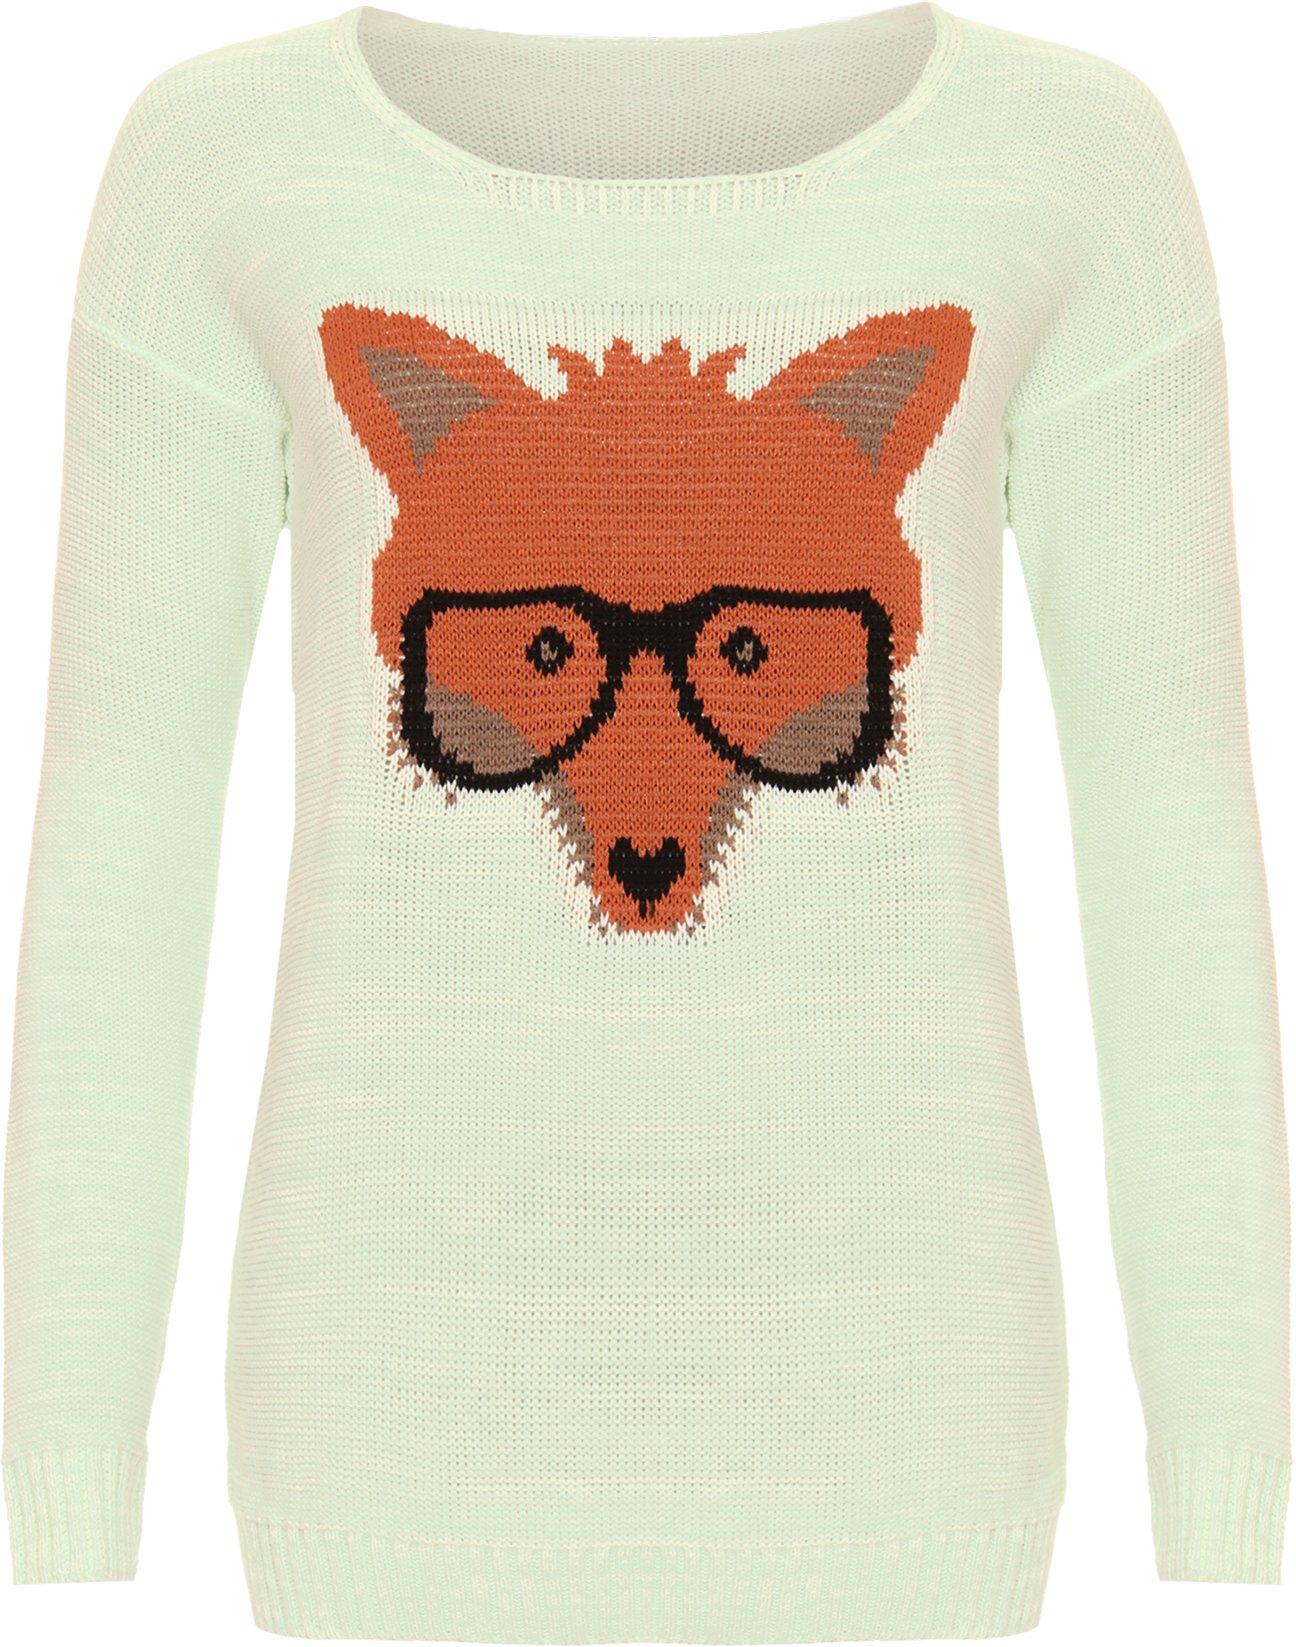 WearAll Women's Fox Glasses Knitted Ladies Long Sleeve Jumper Top - Mint Green - US 8-10 (UK 12-14)